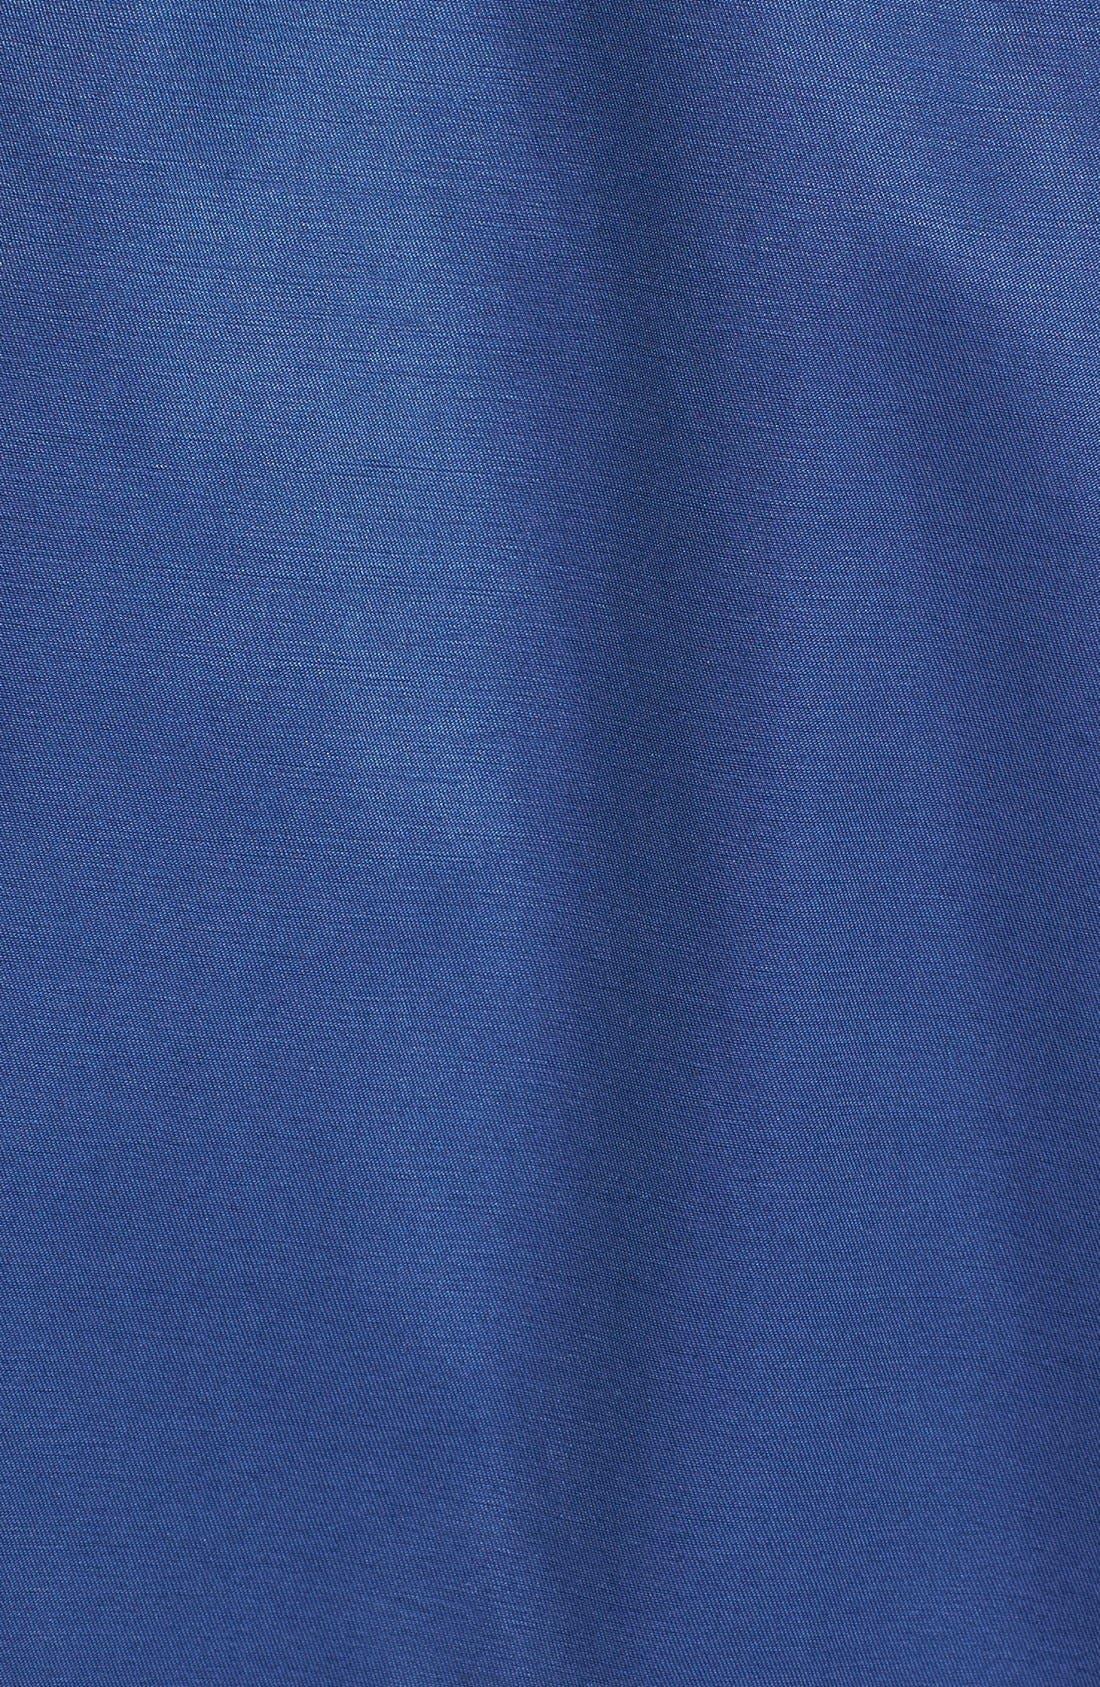 Alternate Image 5  - Steve Madden Trench Coat with Detachable Hood